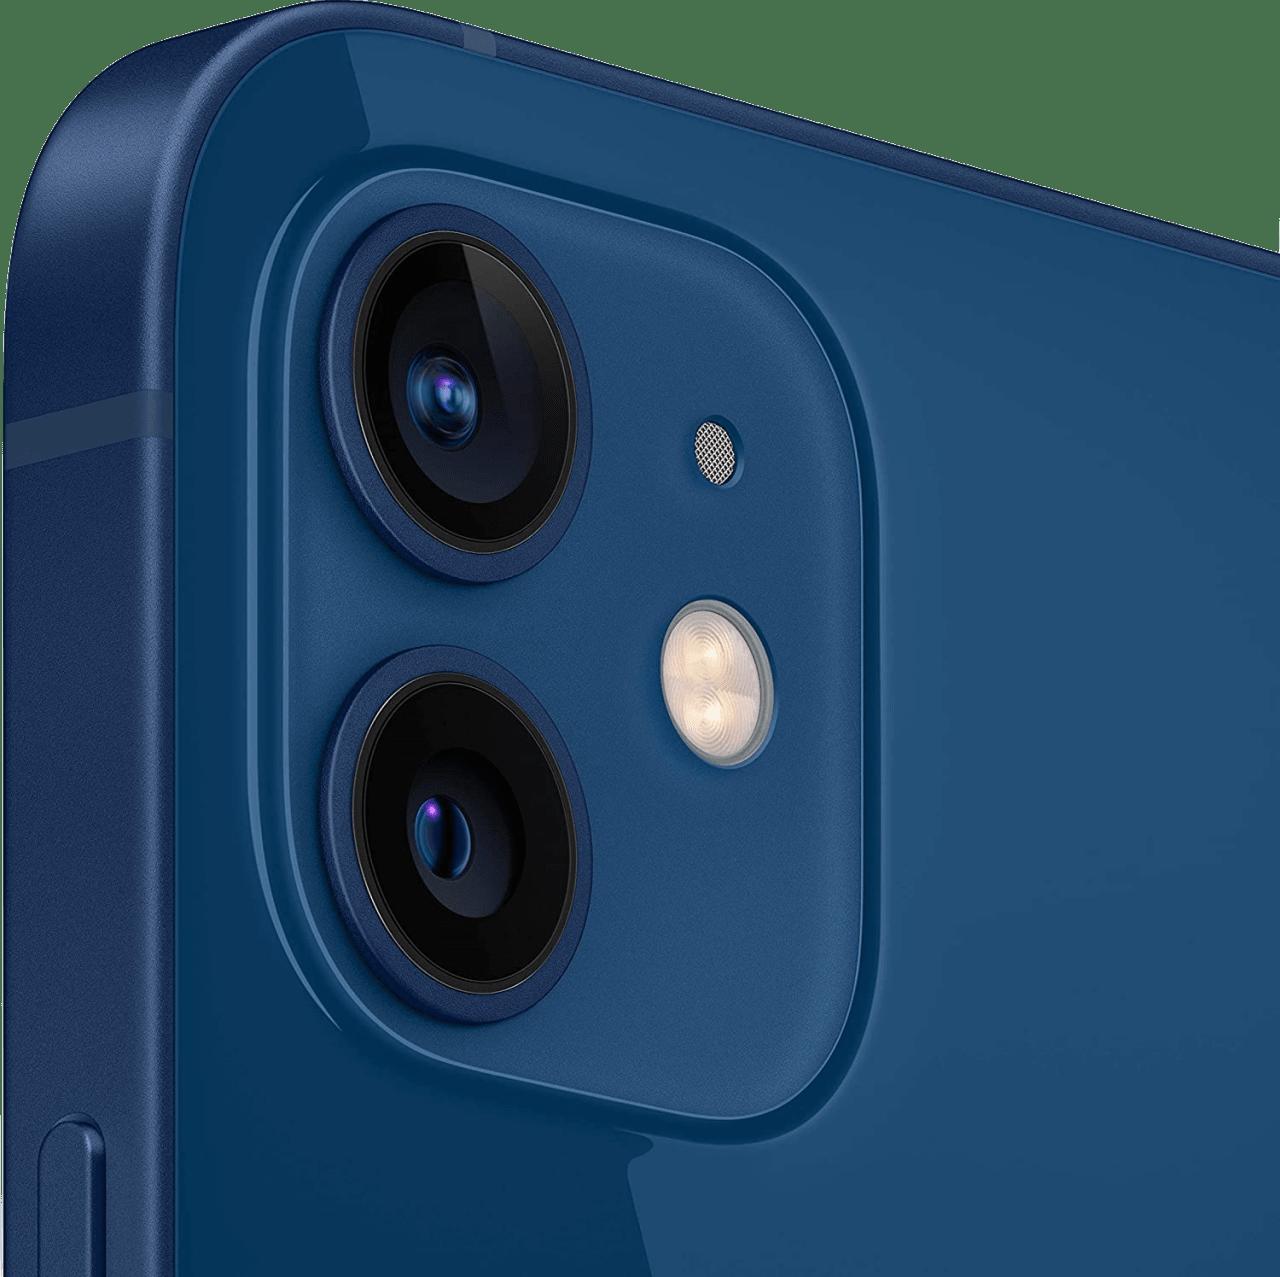 Blau Apple iPhone 12 mini 64GB.4